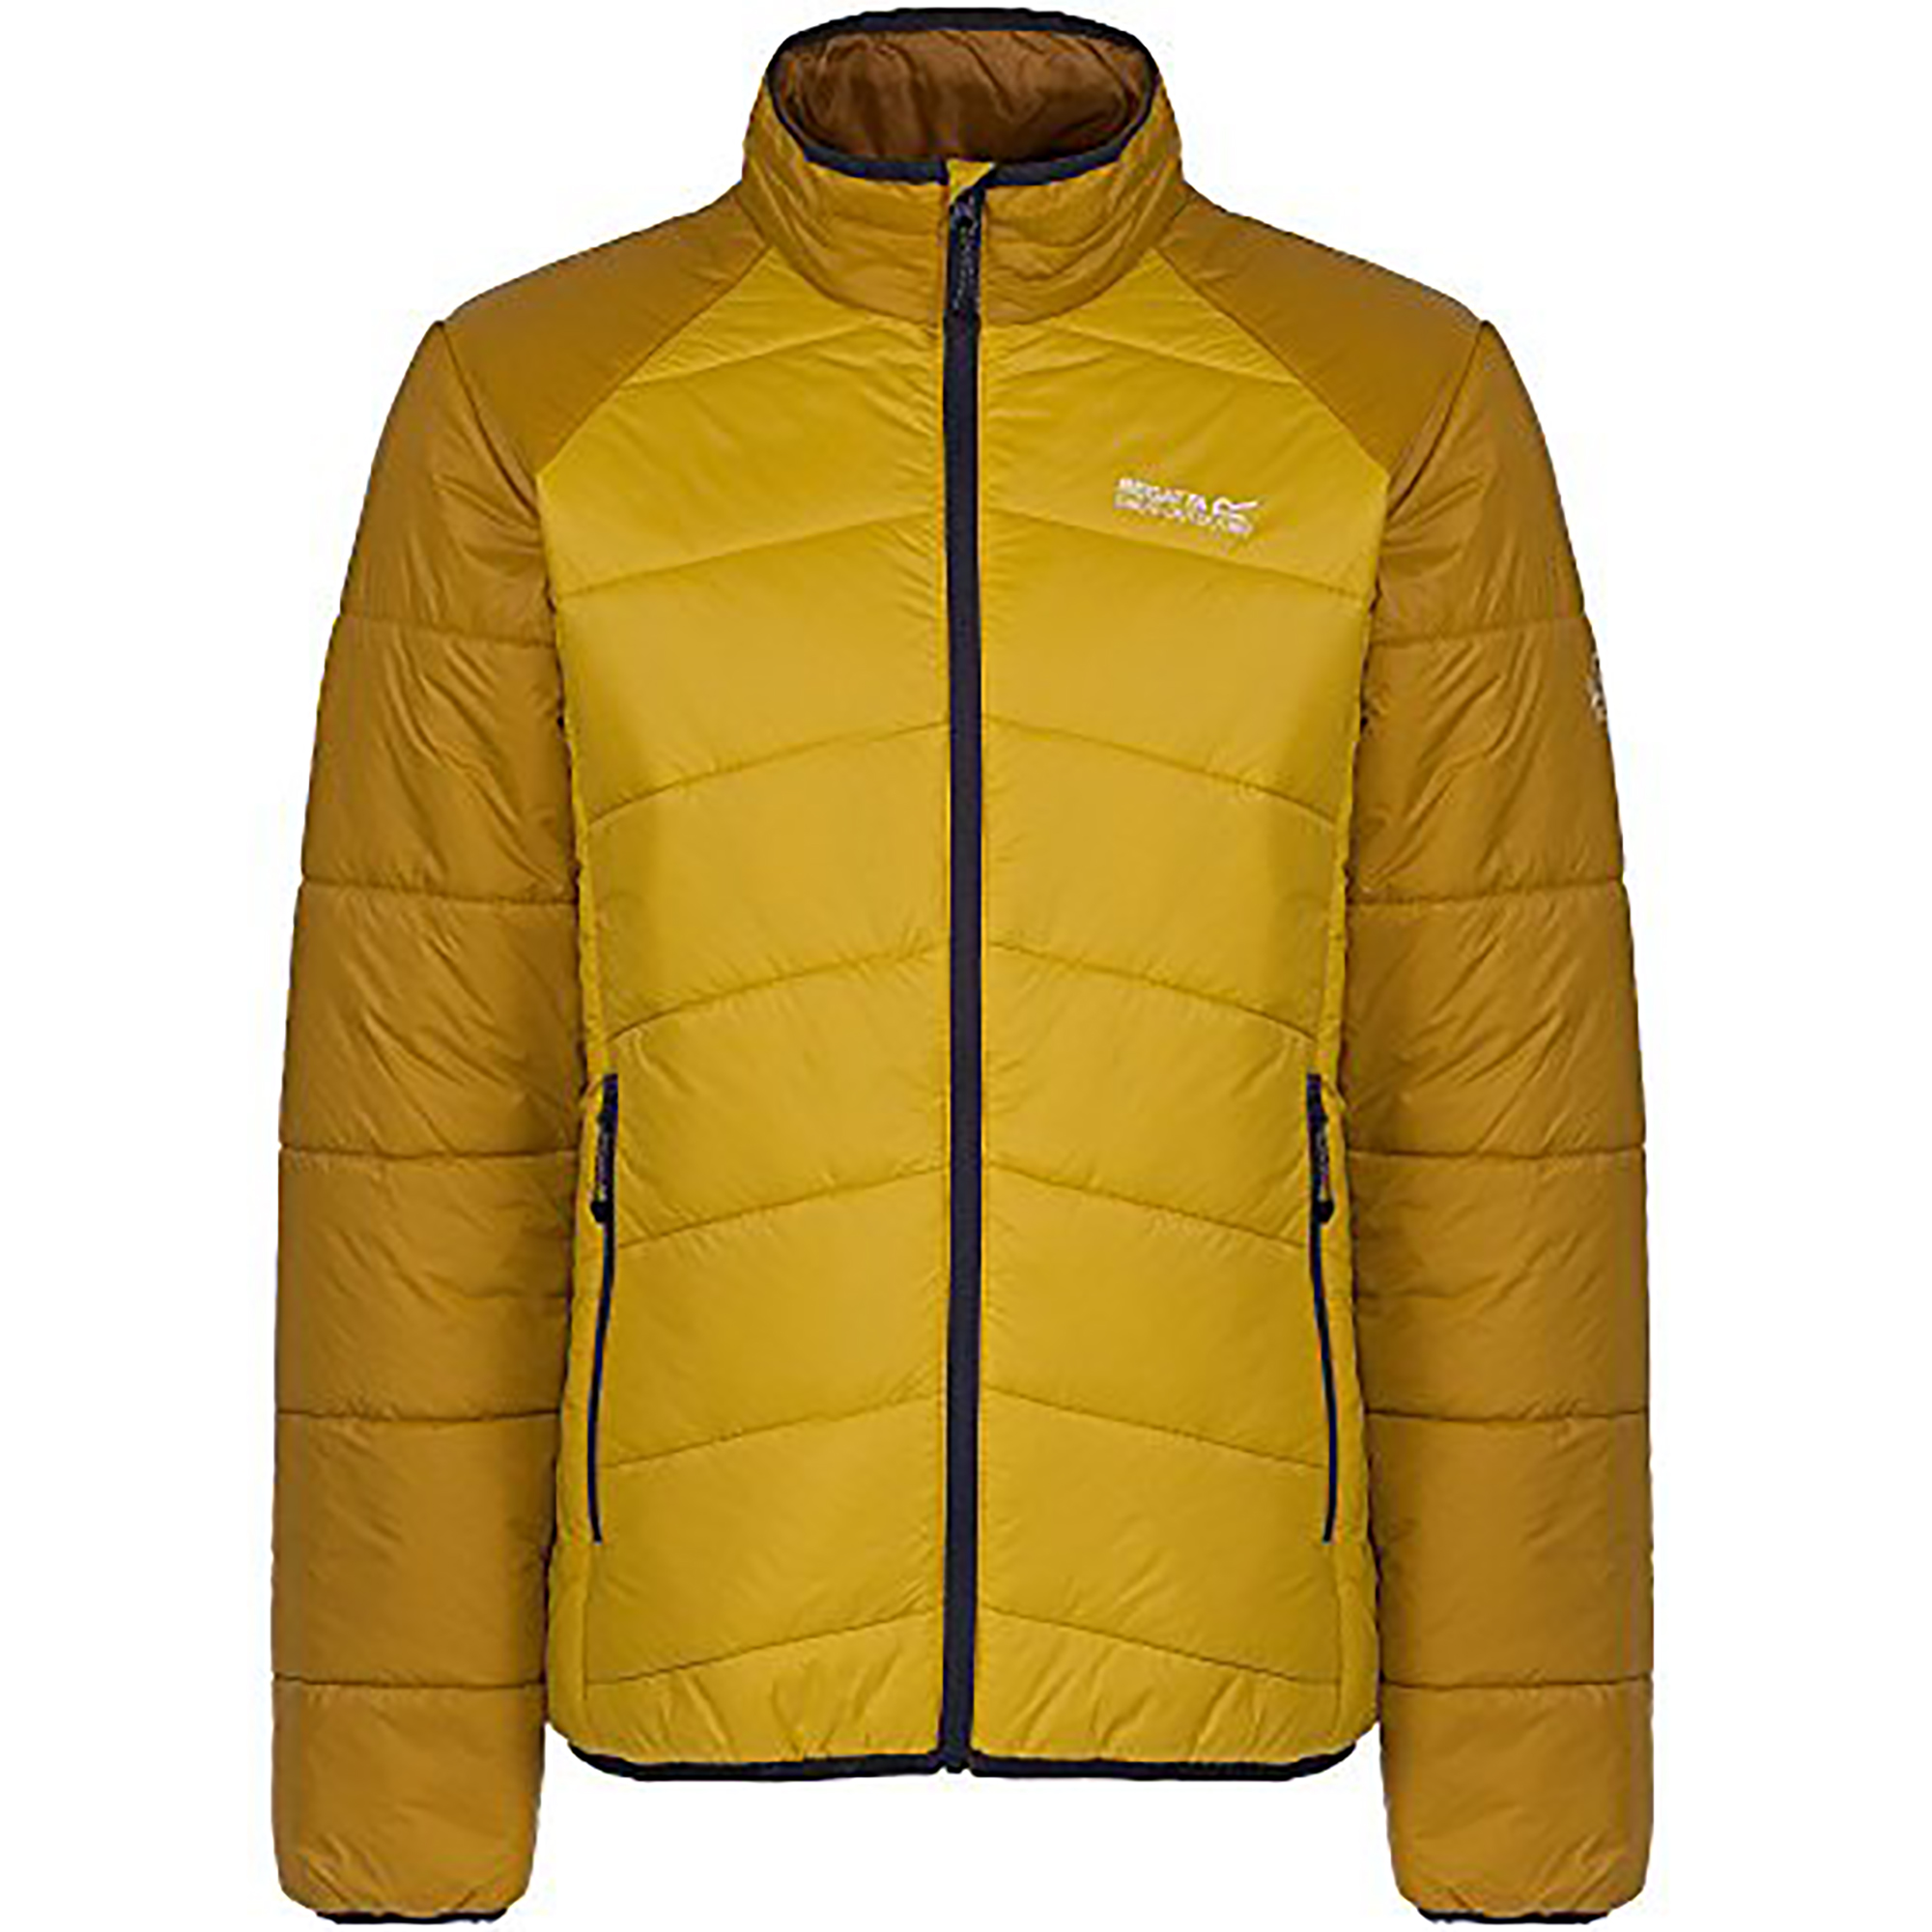 Mens regatta jacket - Regatta Great Outdoors Mens Icebound Ii Insulated Jacket